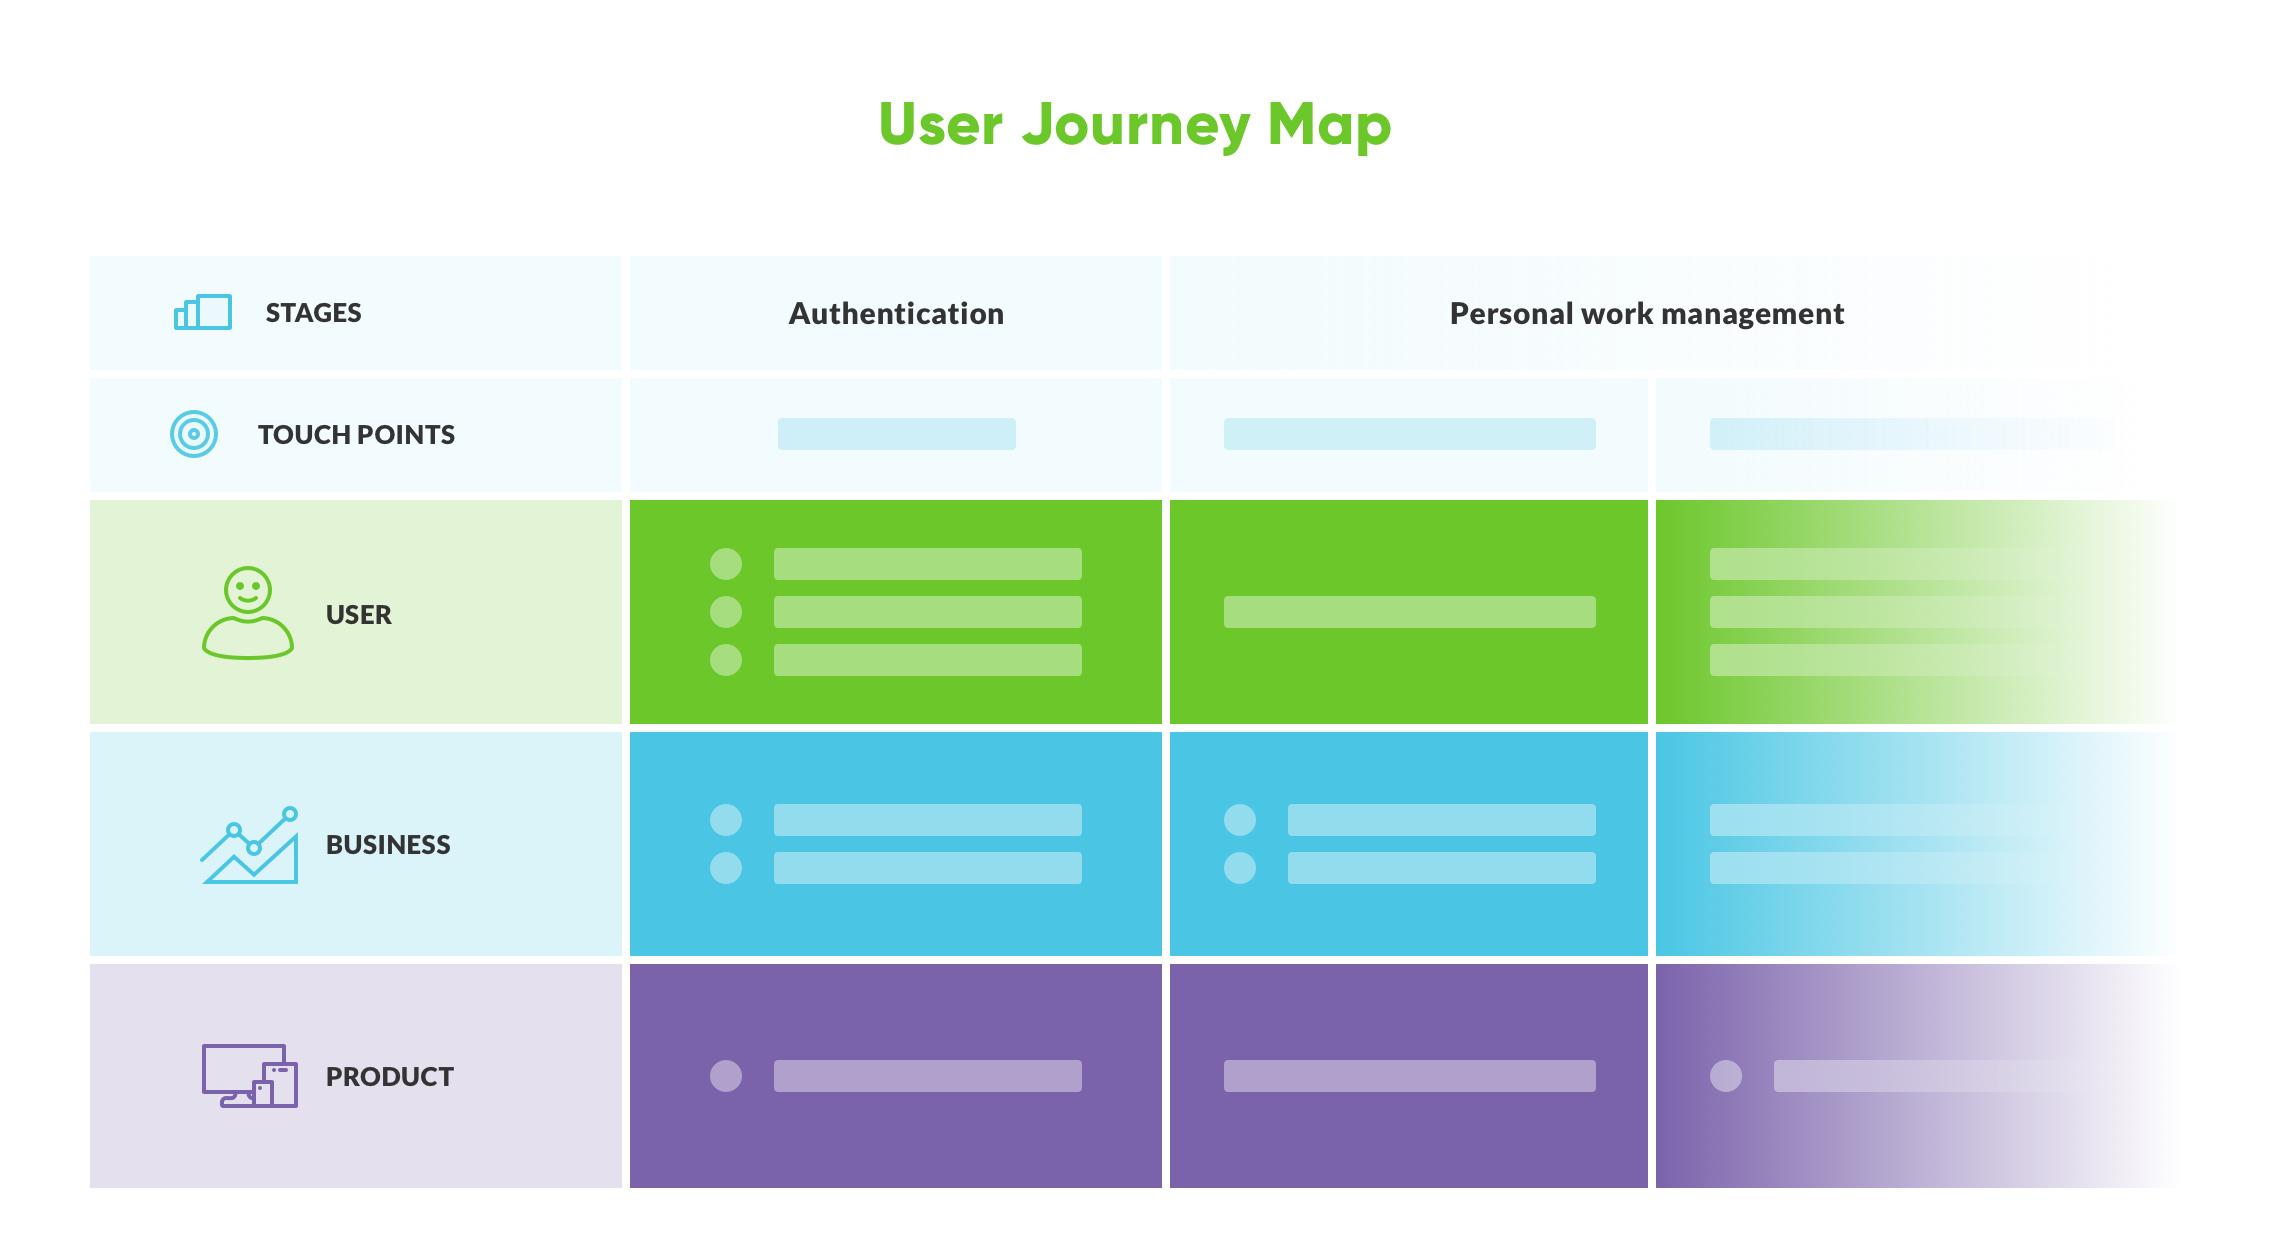 user-journey-mapping-uxda-work-process-ux-design.jpg-L-1.jpg